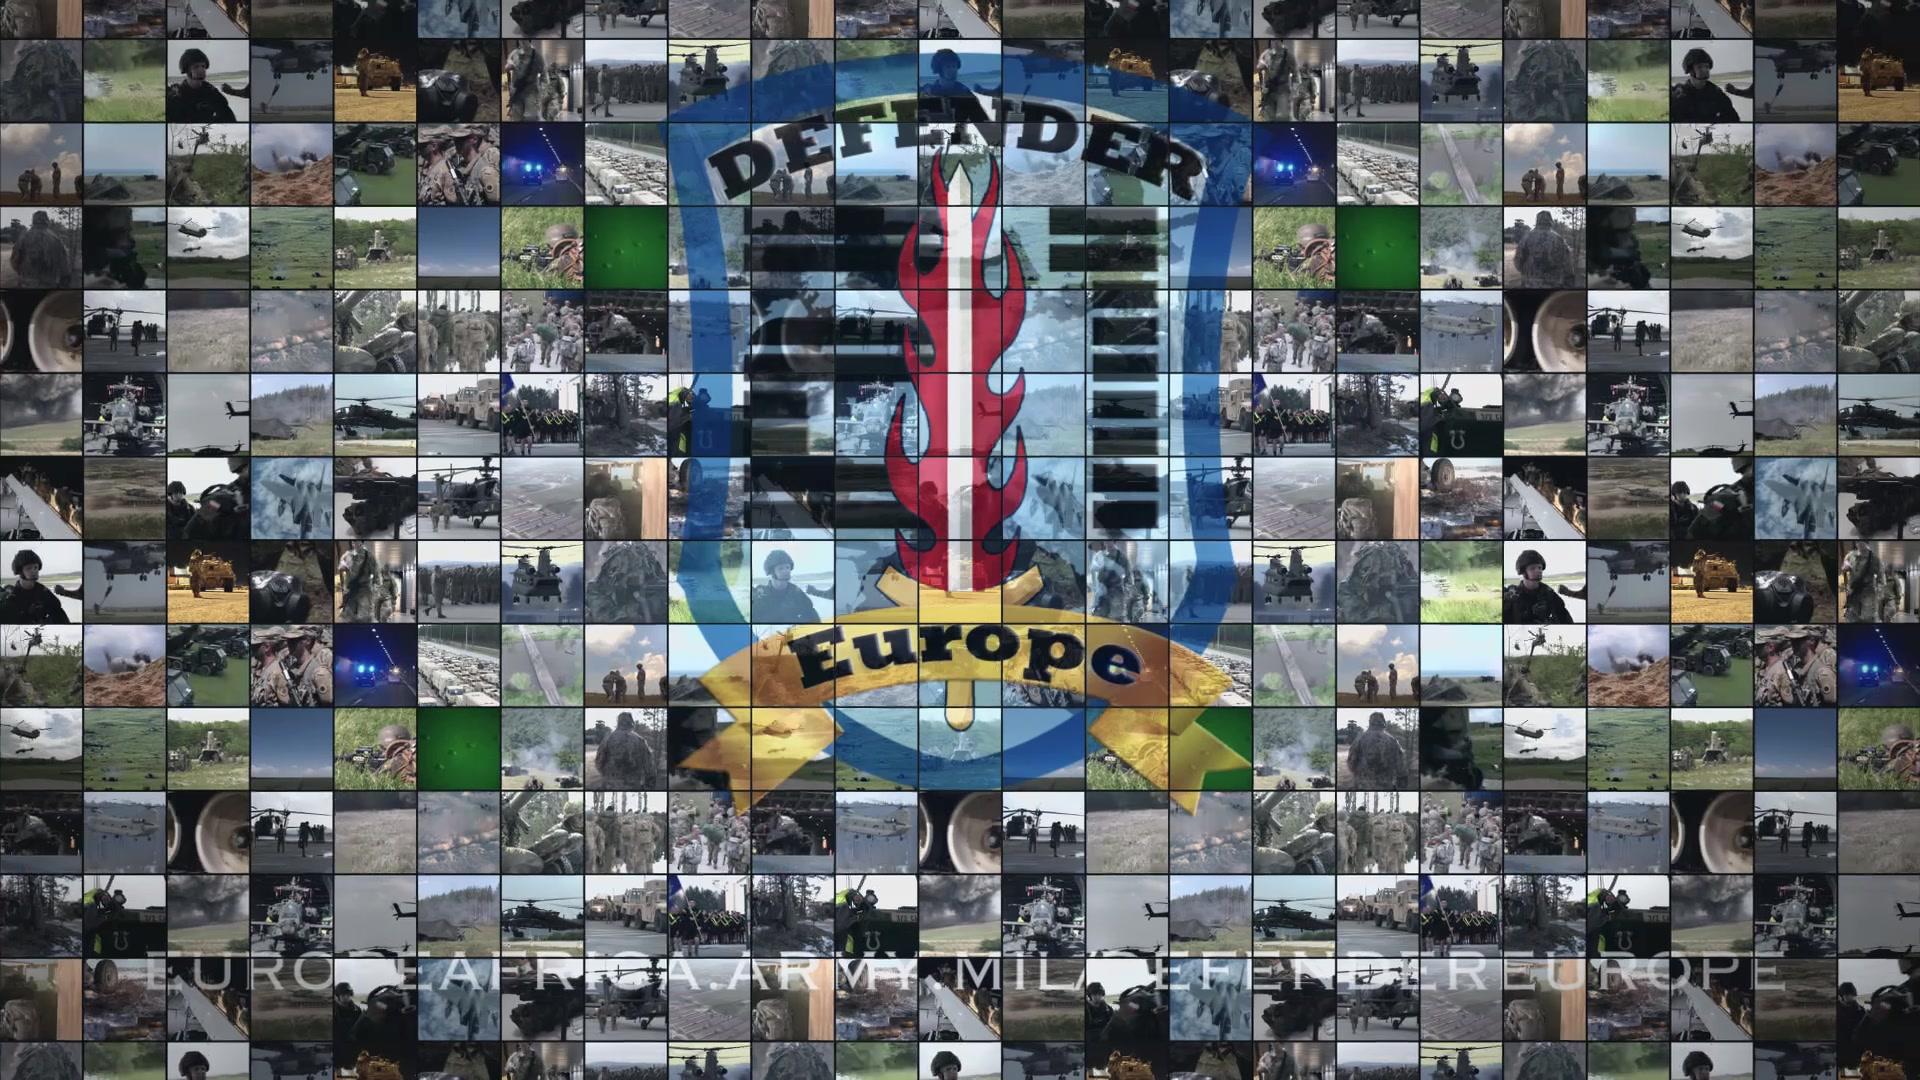 DEFENDER-Europe 21 activities begin this month